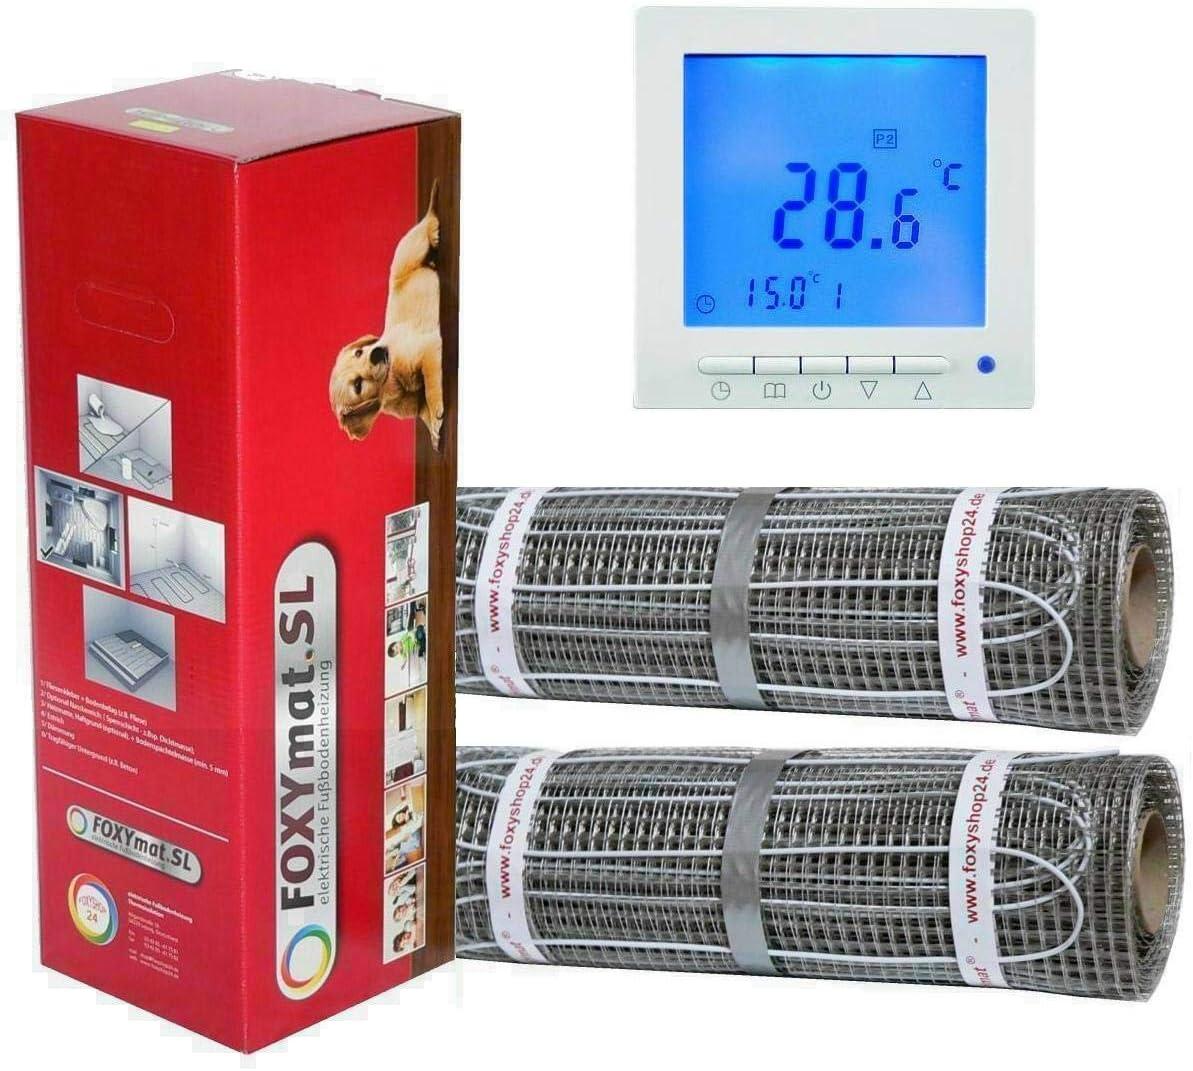 mit Thermostat QM-BLUE 160 Watt pro m/² 2 x 8m/² elektrische Fu/ßbodenheizung FOXYMAT.SL 16 m/²